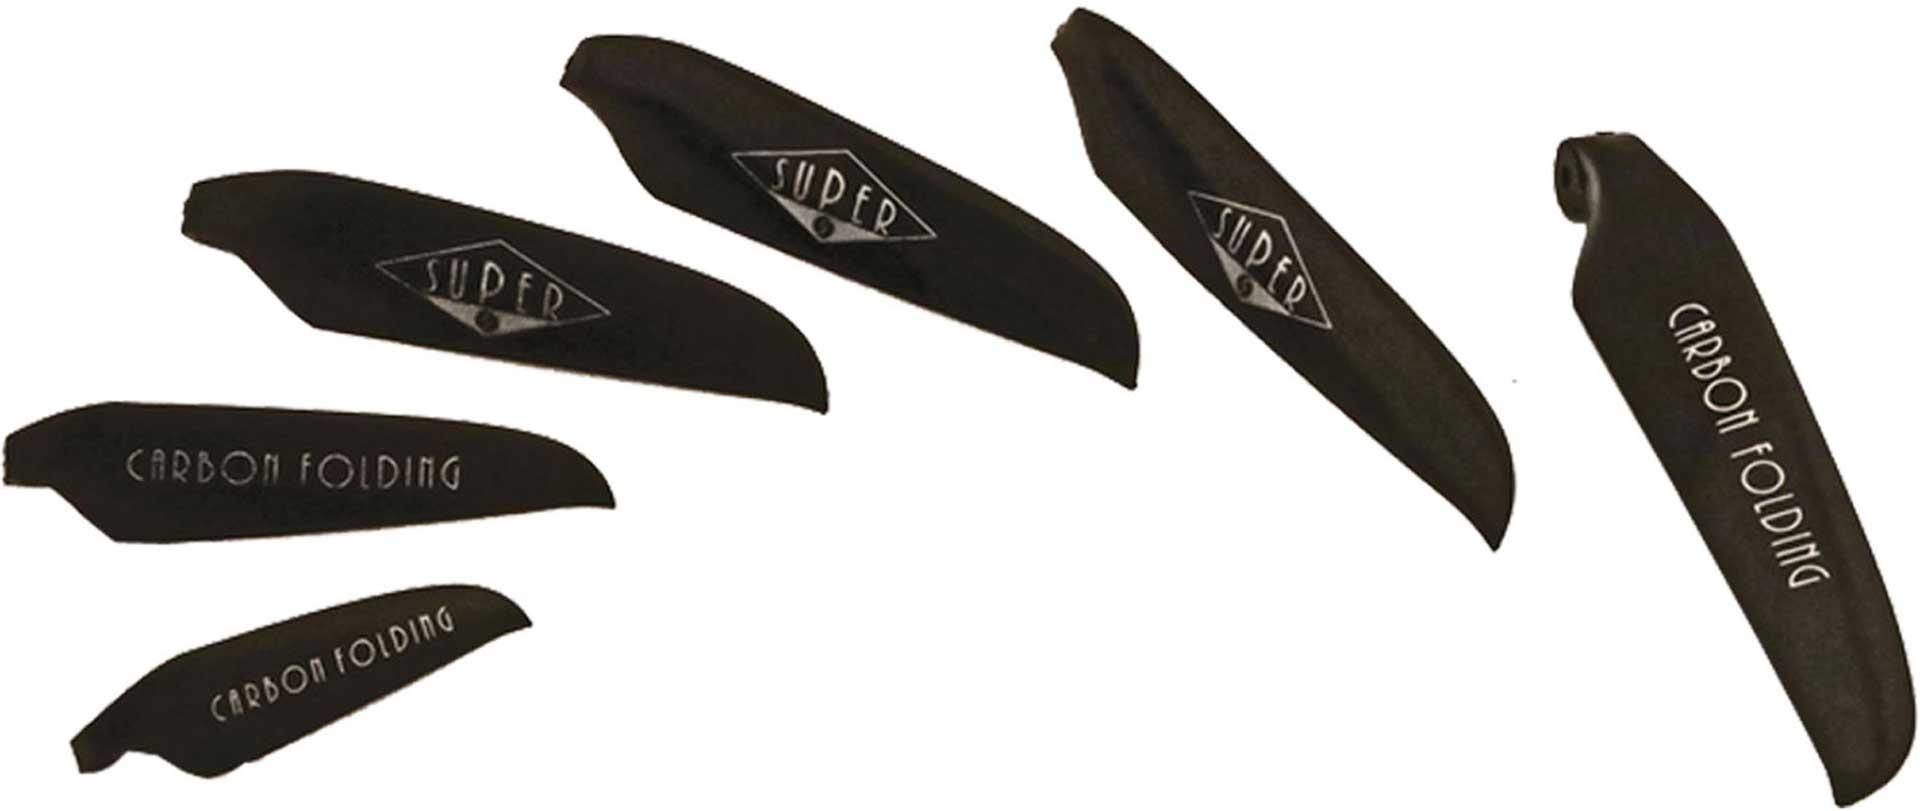 "SUPER CARBON FOLDING SPARE BLADES 13/10"" , 8MM LEAF ROOT 33/25CM BLACK 2PCS. AIR SCREW"